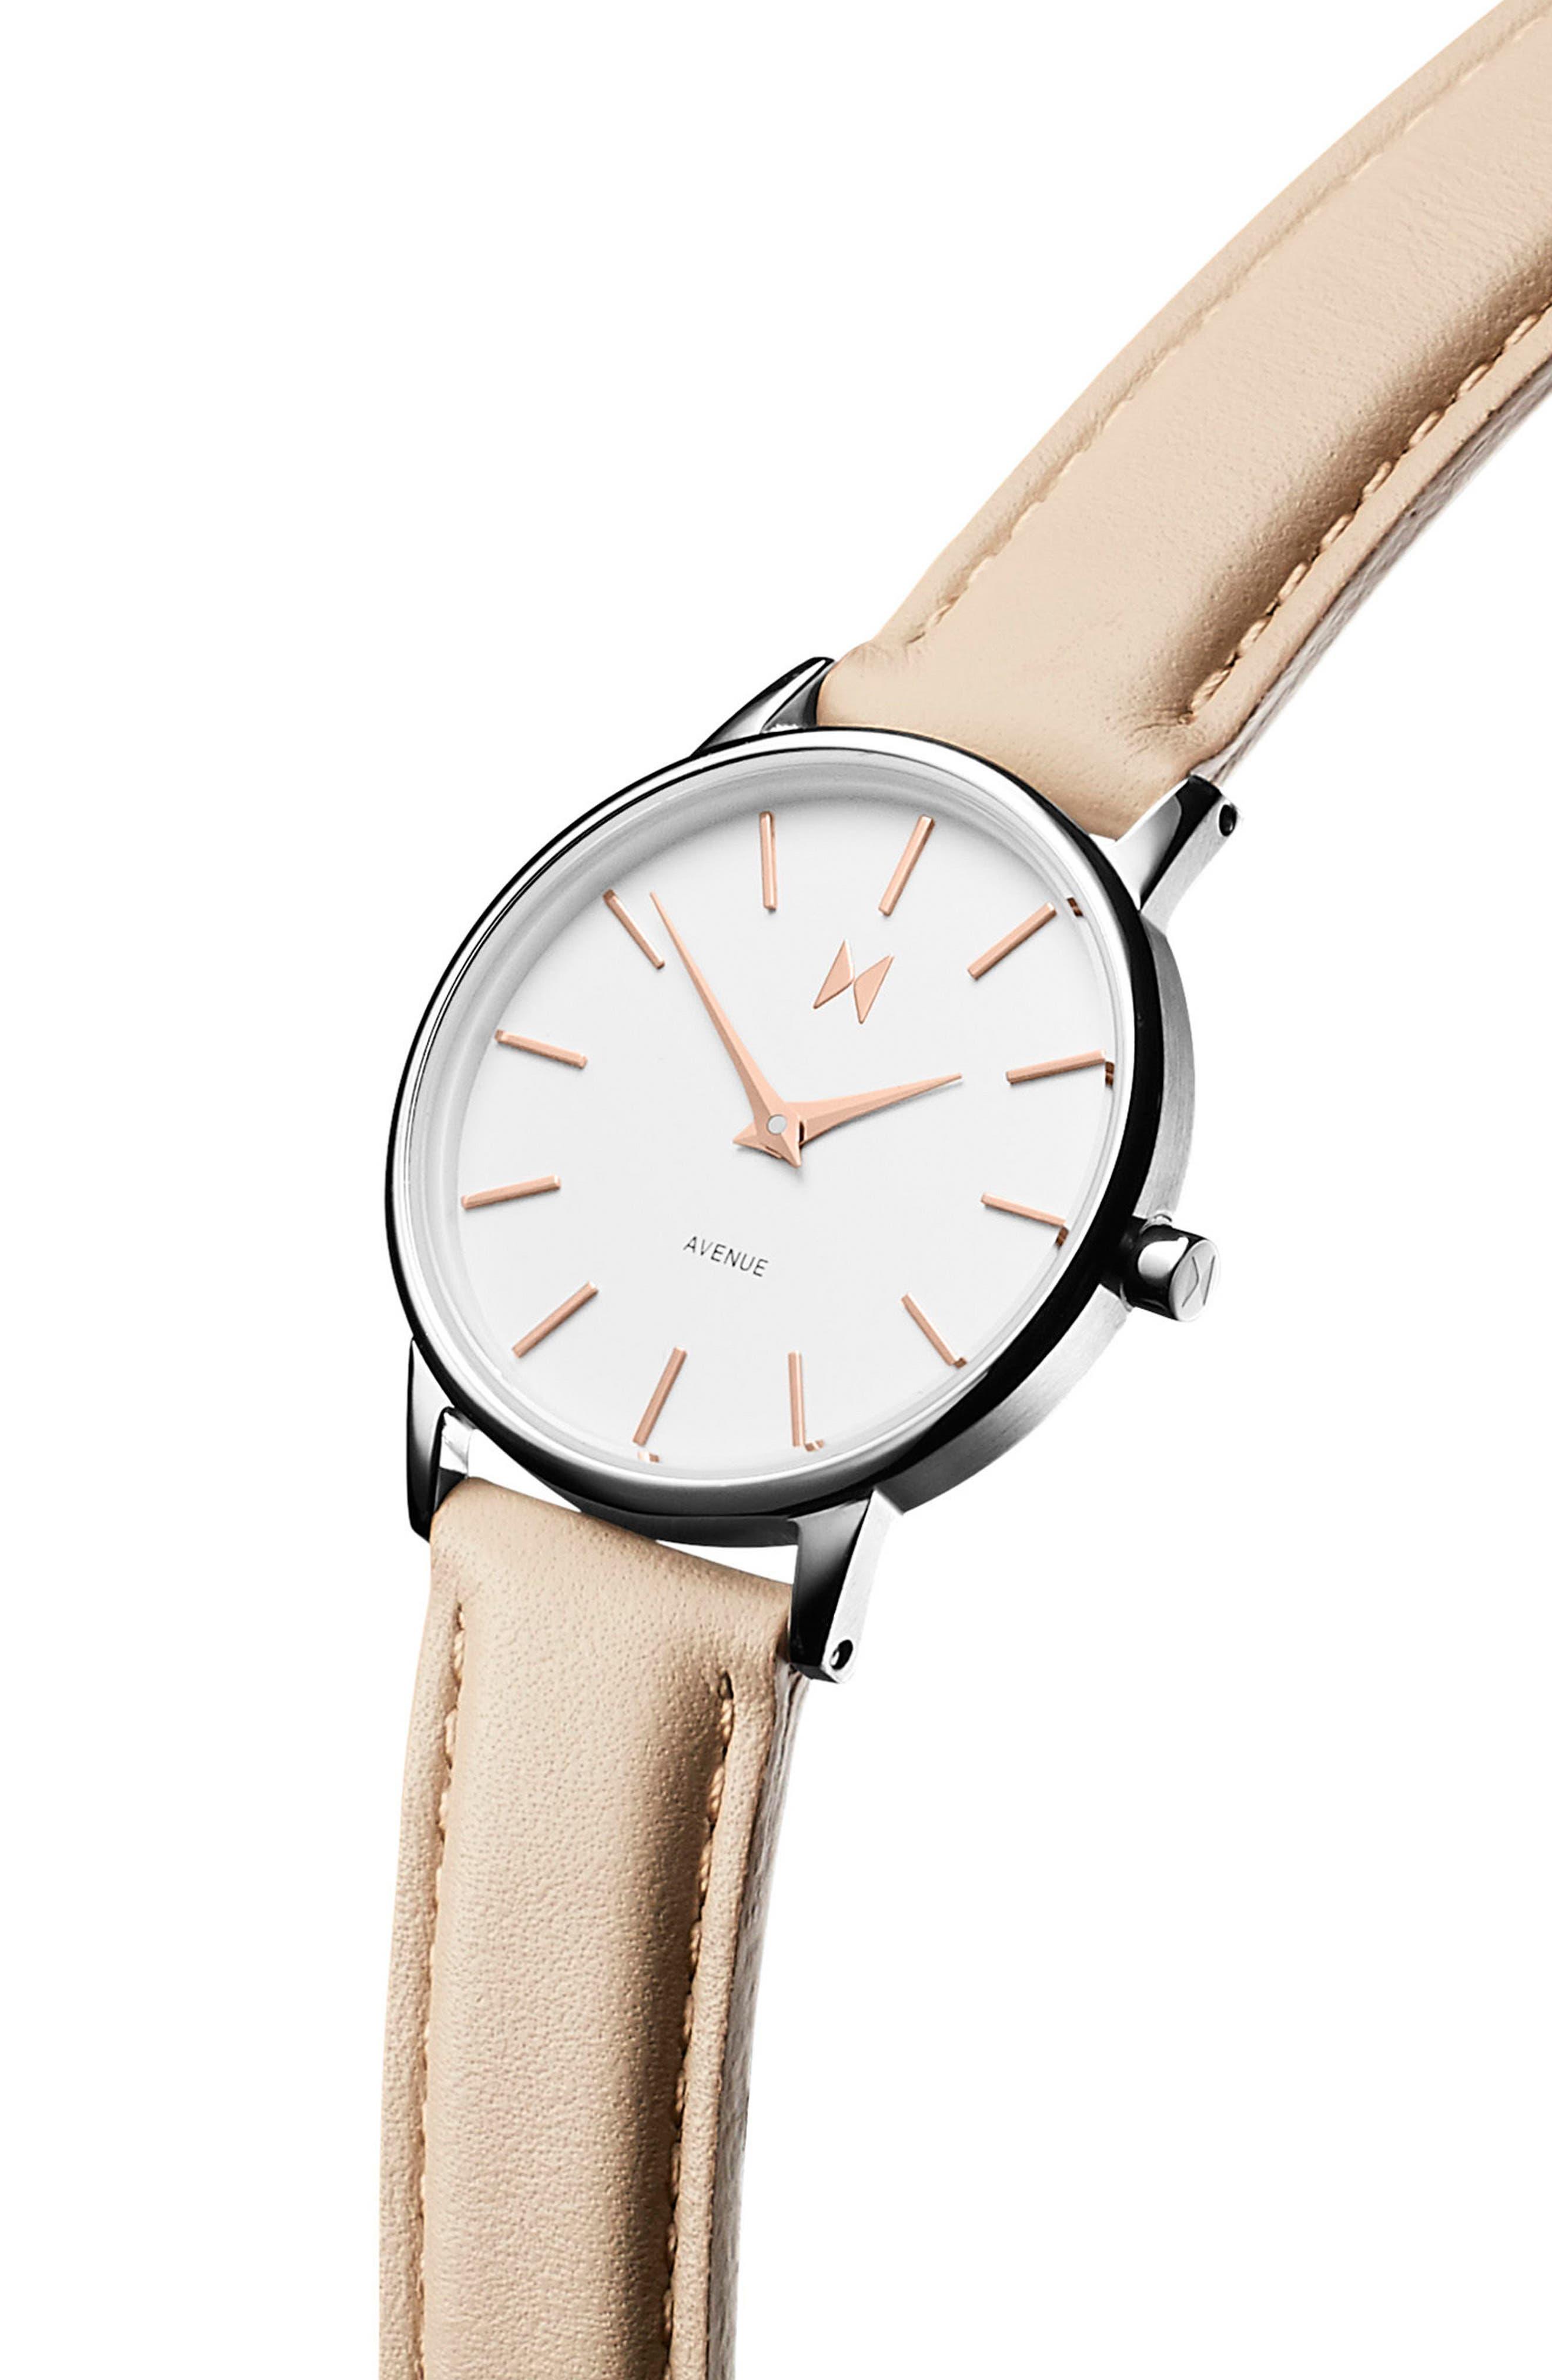 Belamar Leather Strap Watch, 28mm,                             Alternate thumbnail 3, color,                             Creme/ White/ Silver